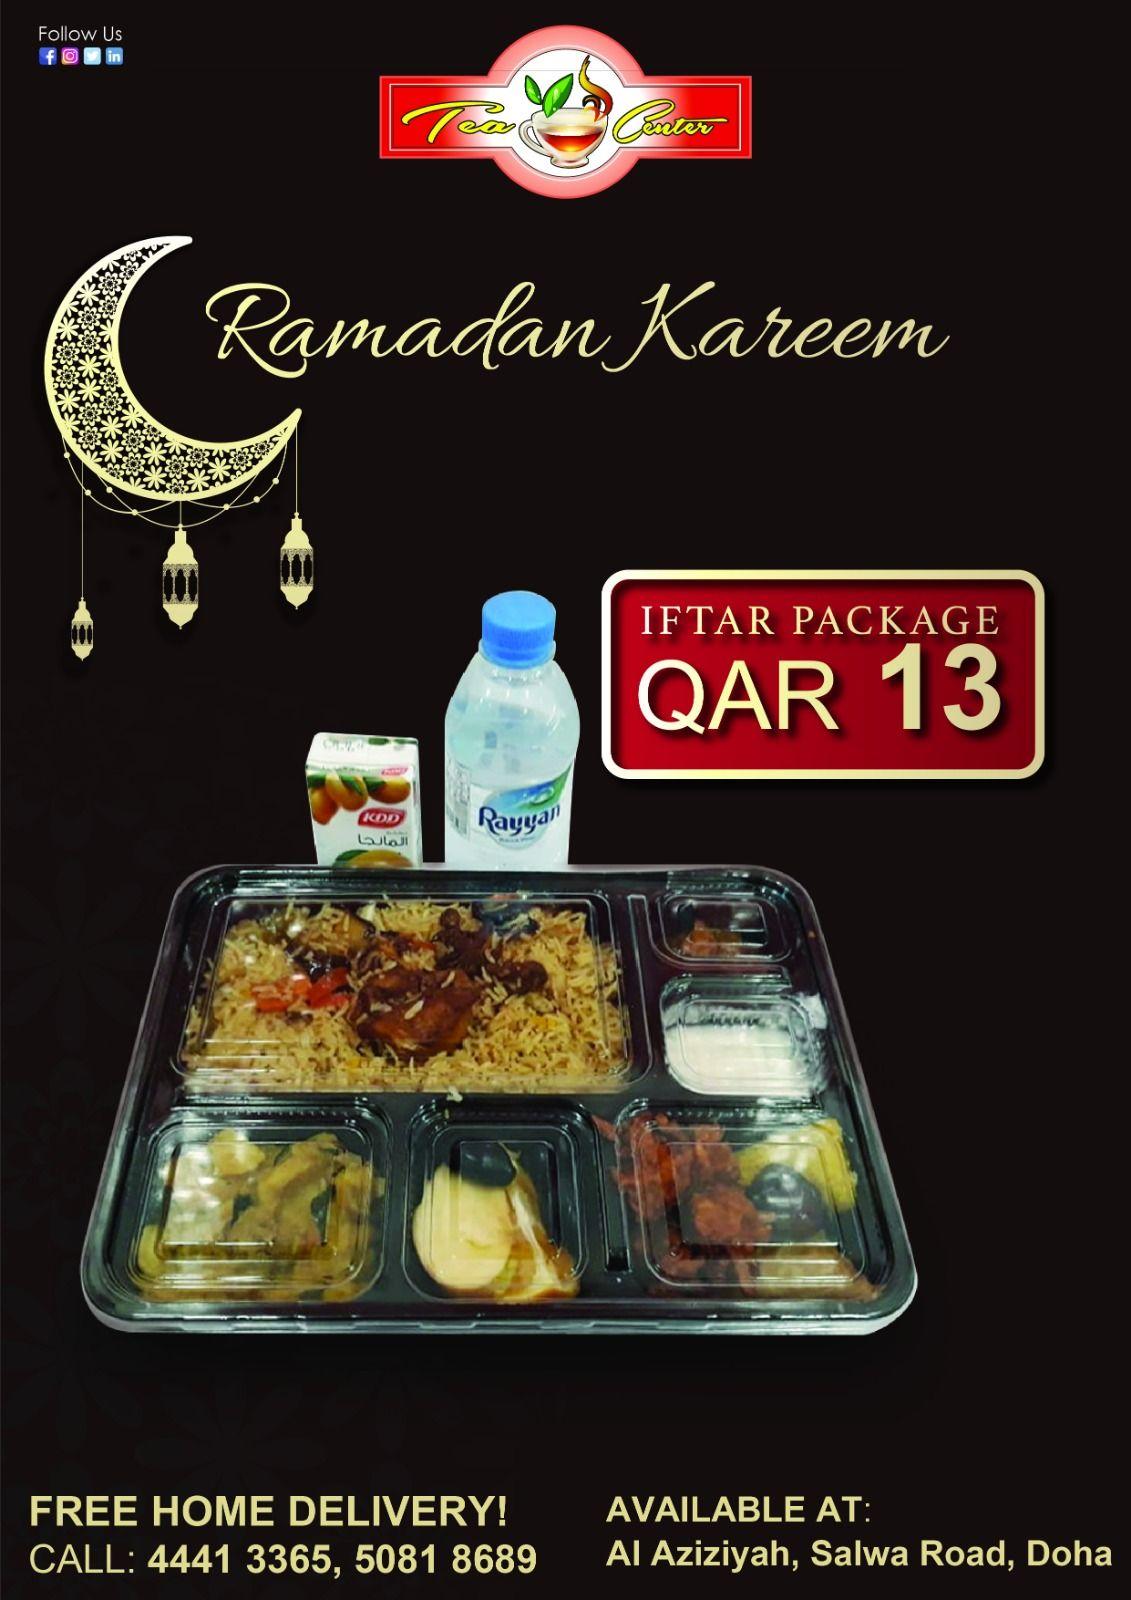 Ramadankareem Iftarspecialmeal Qar13 Only Teacenter